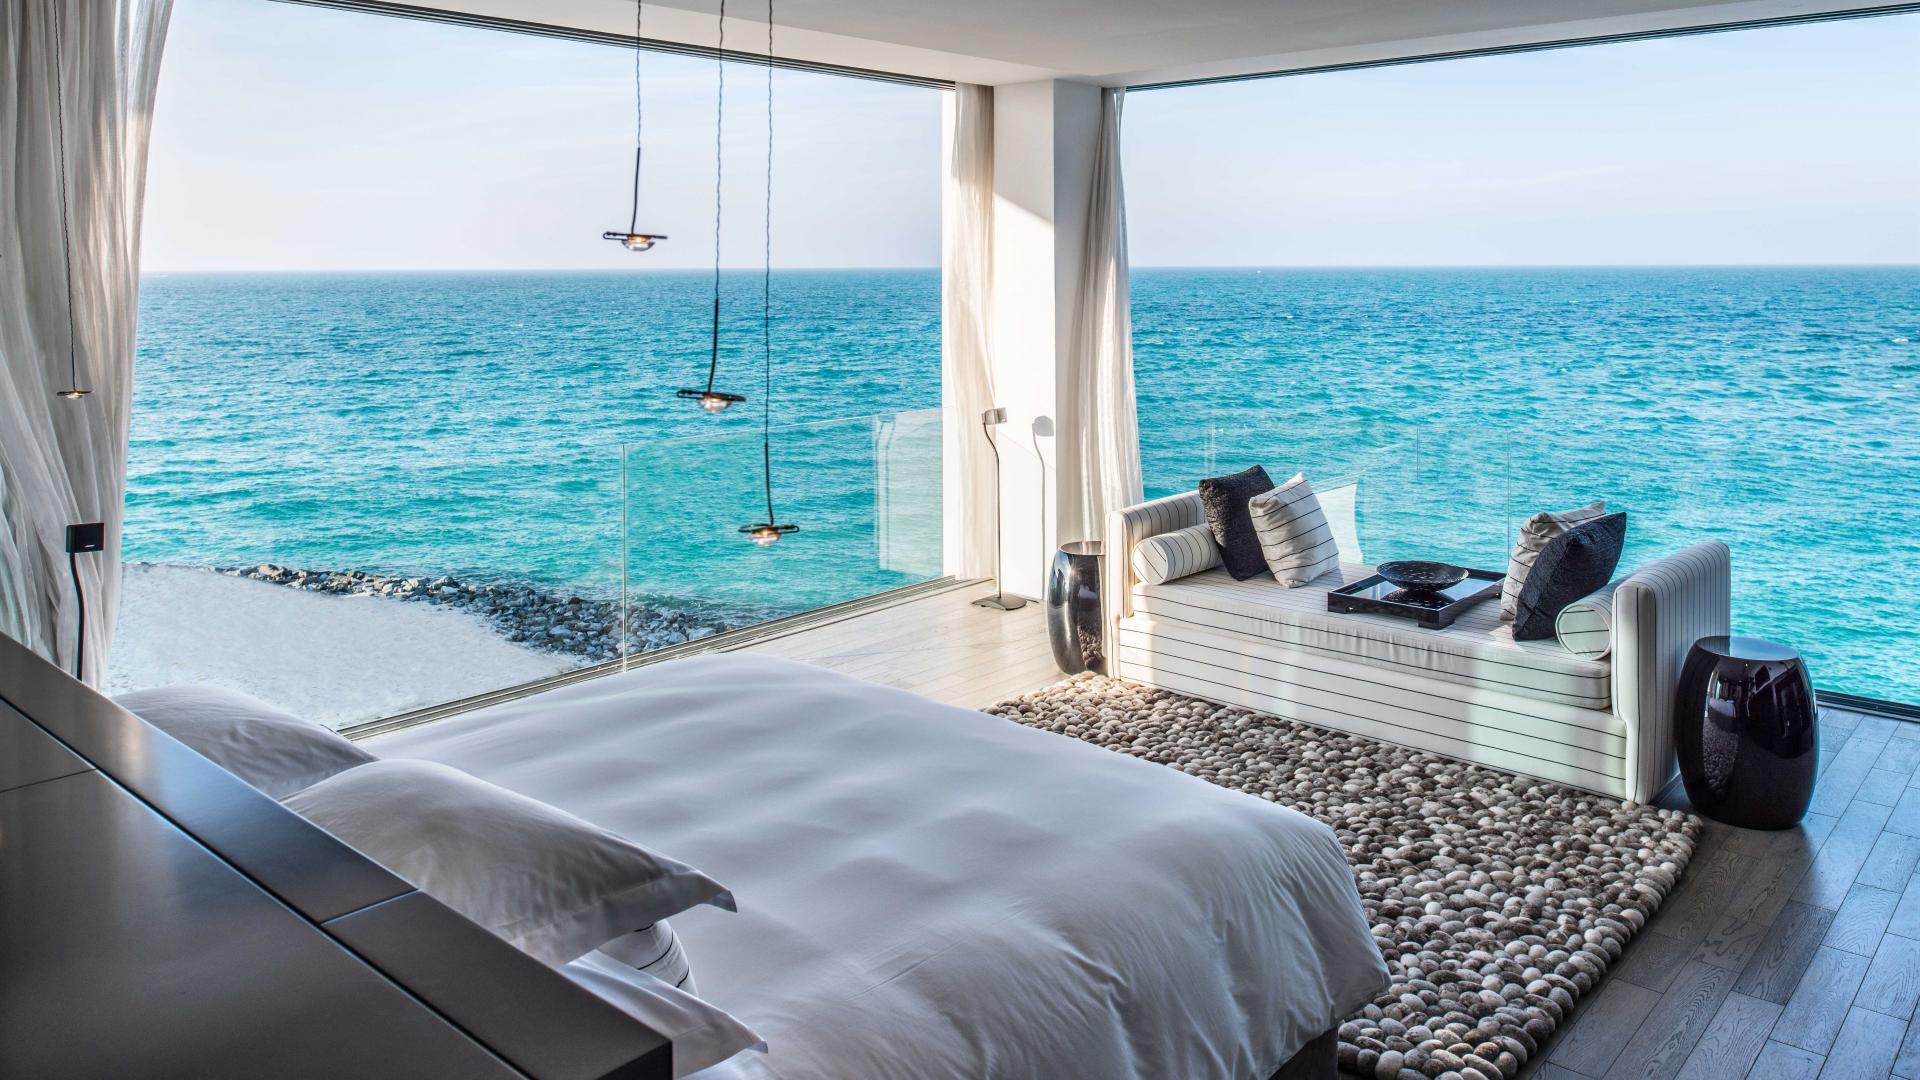 Rooms at Zaya Nurai Island